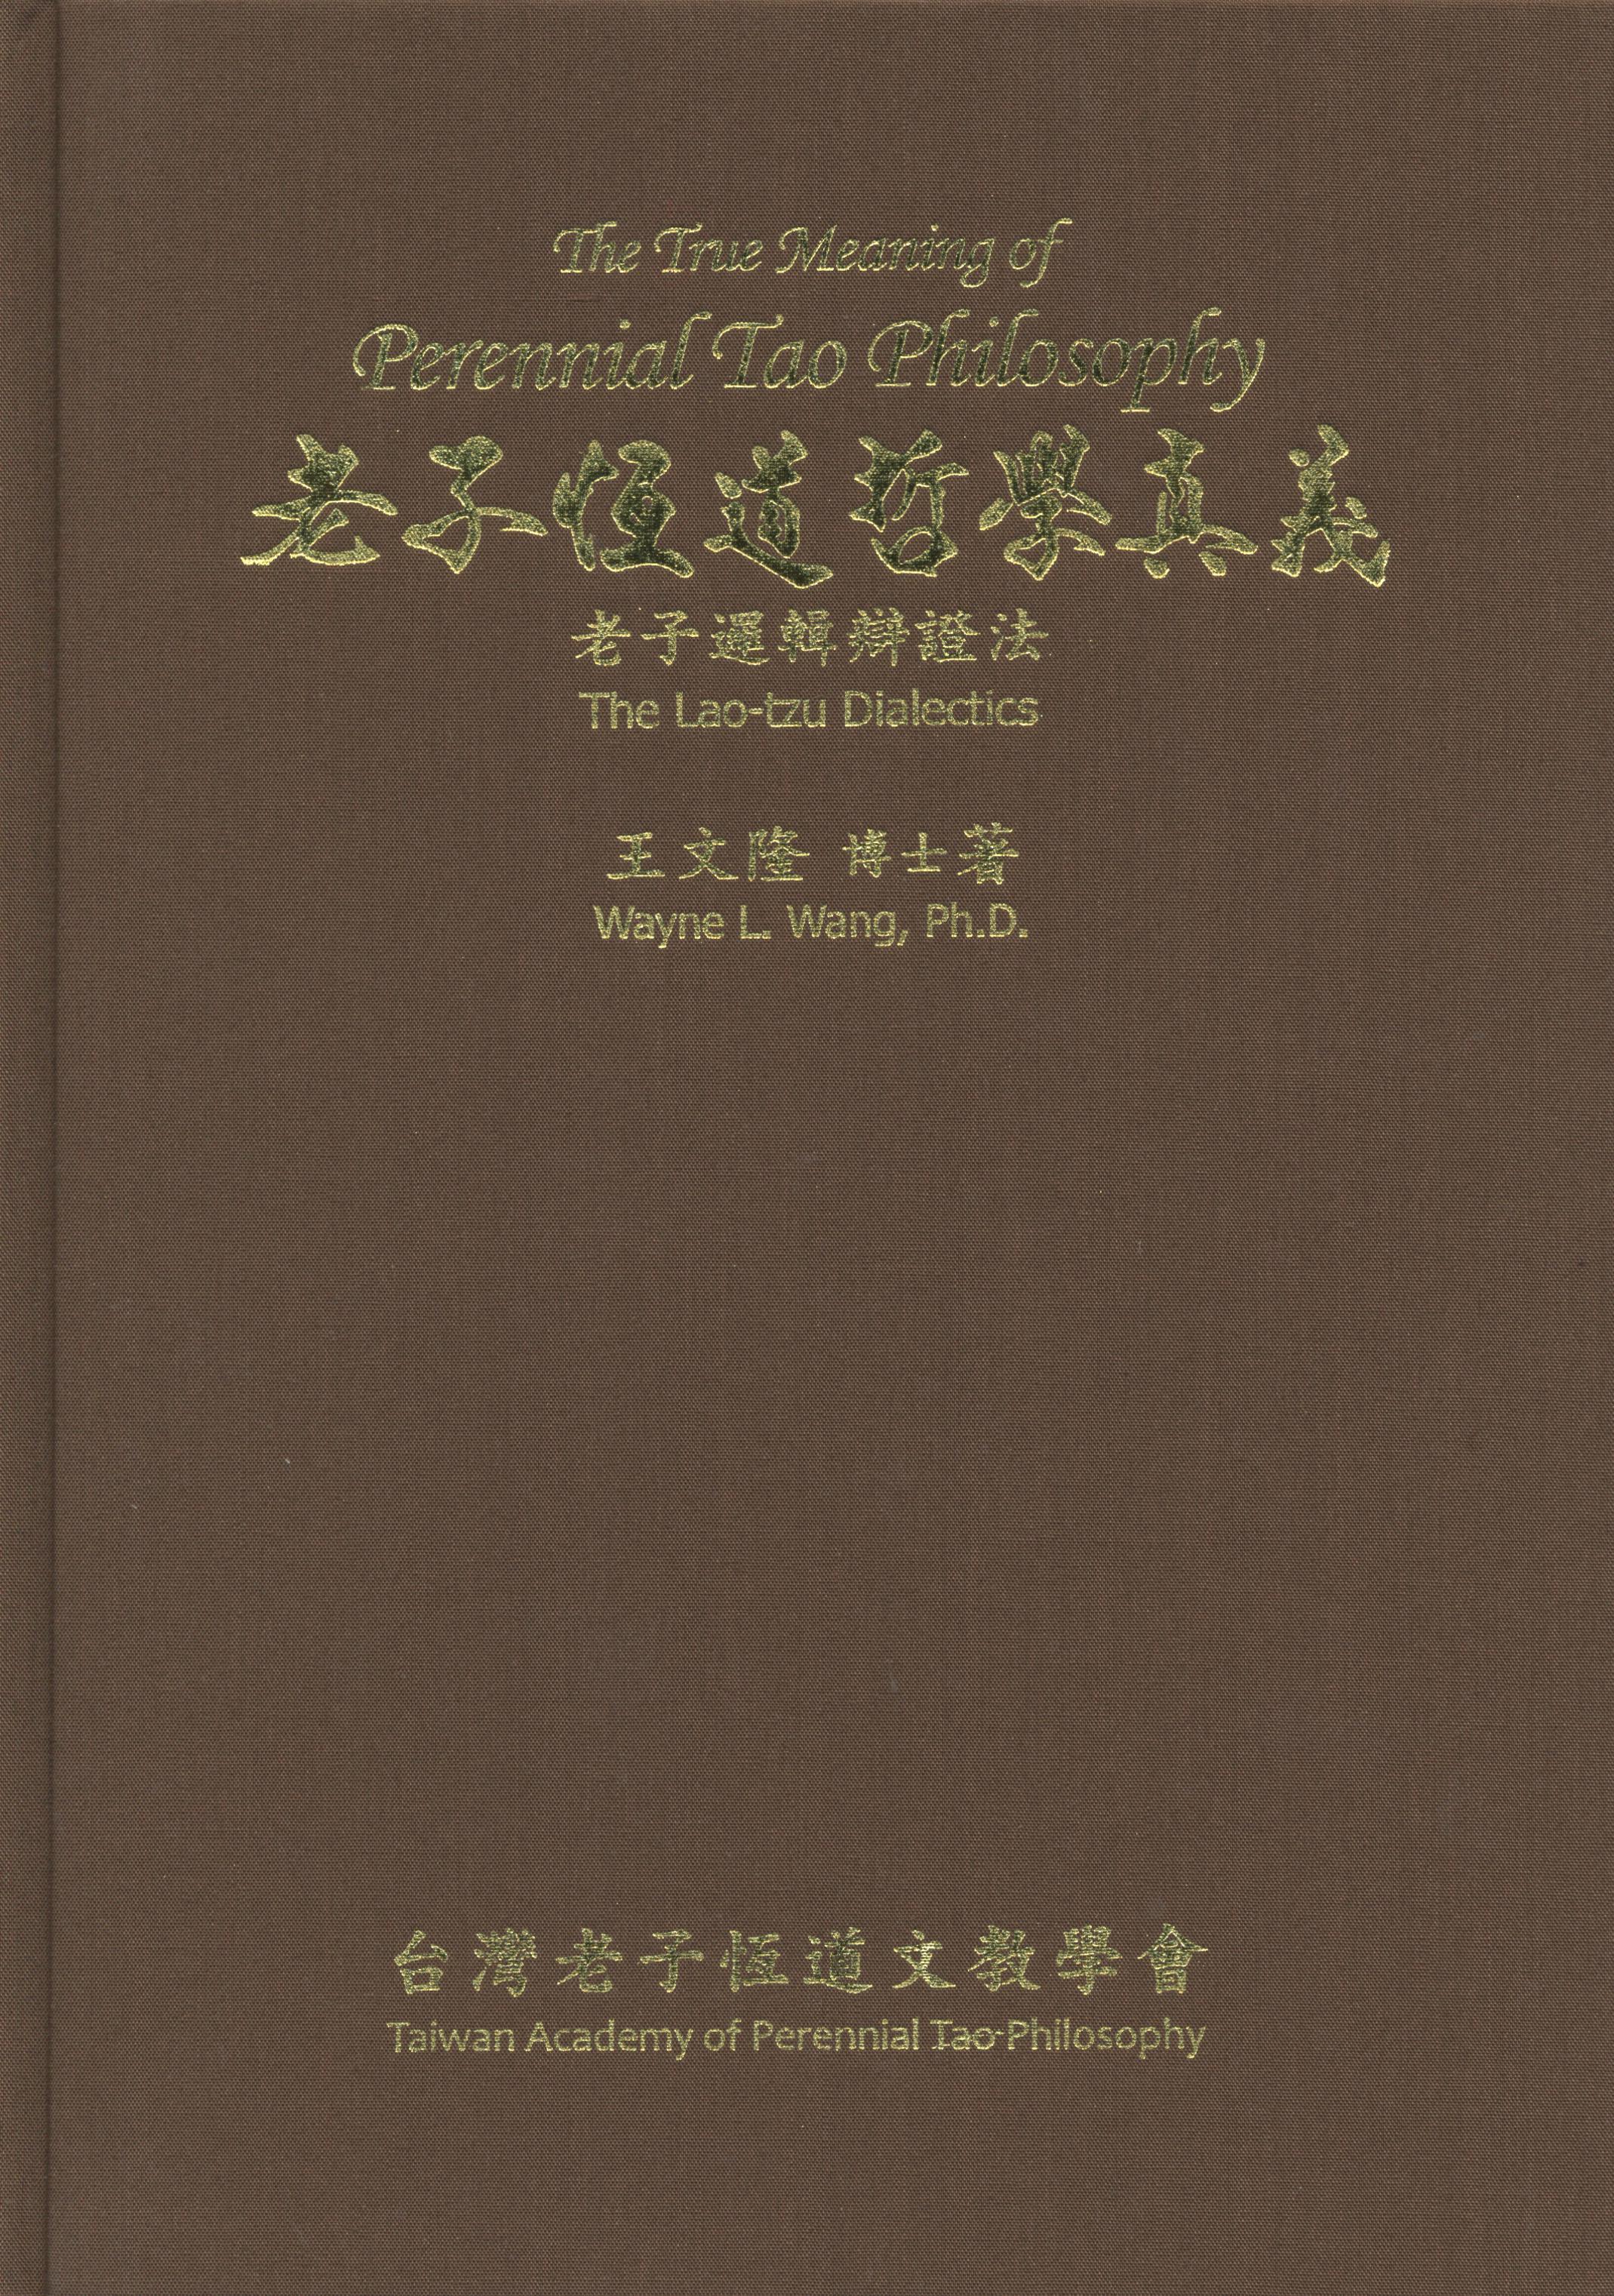 1278. The True Meaning of Perennial Tao Philosophy/Wayne L. Wang, Ph.D./2019